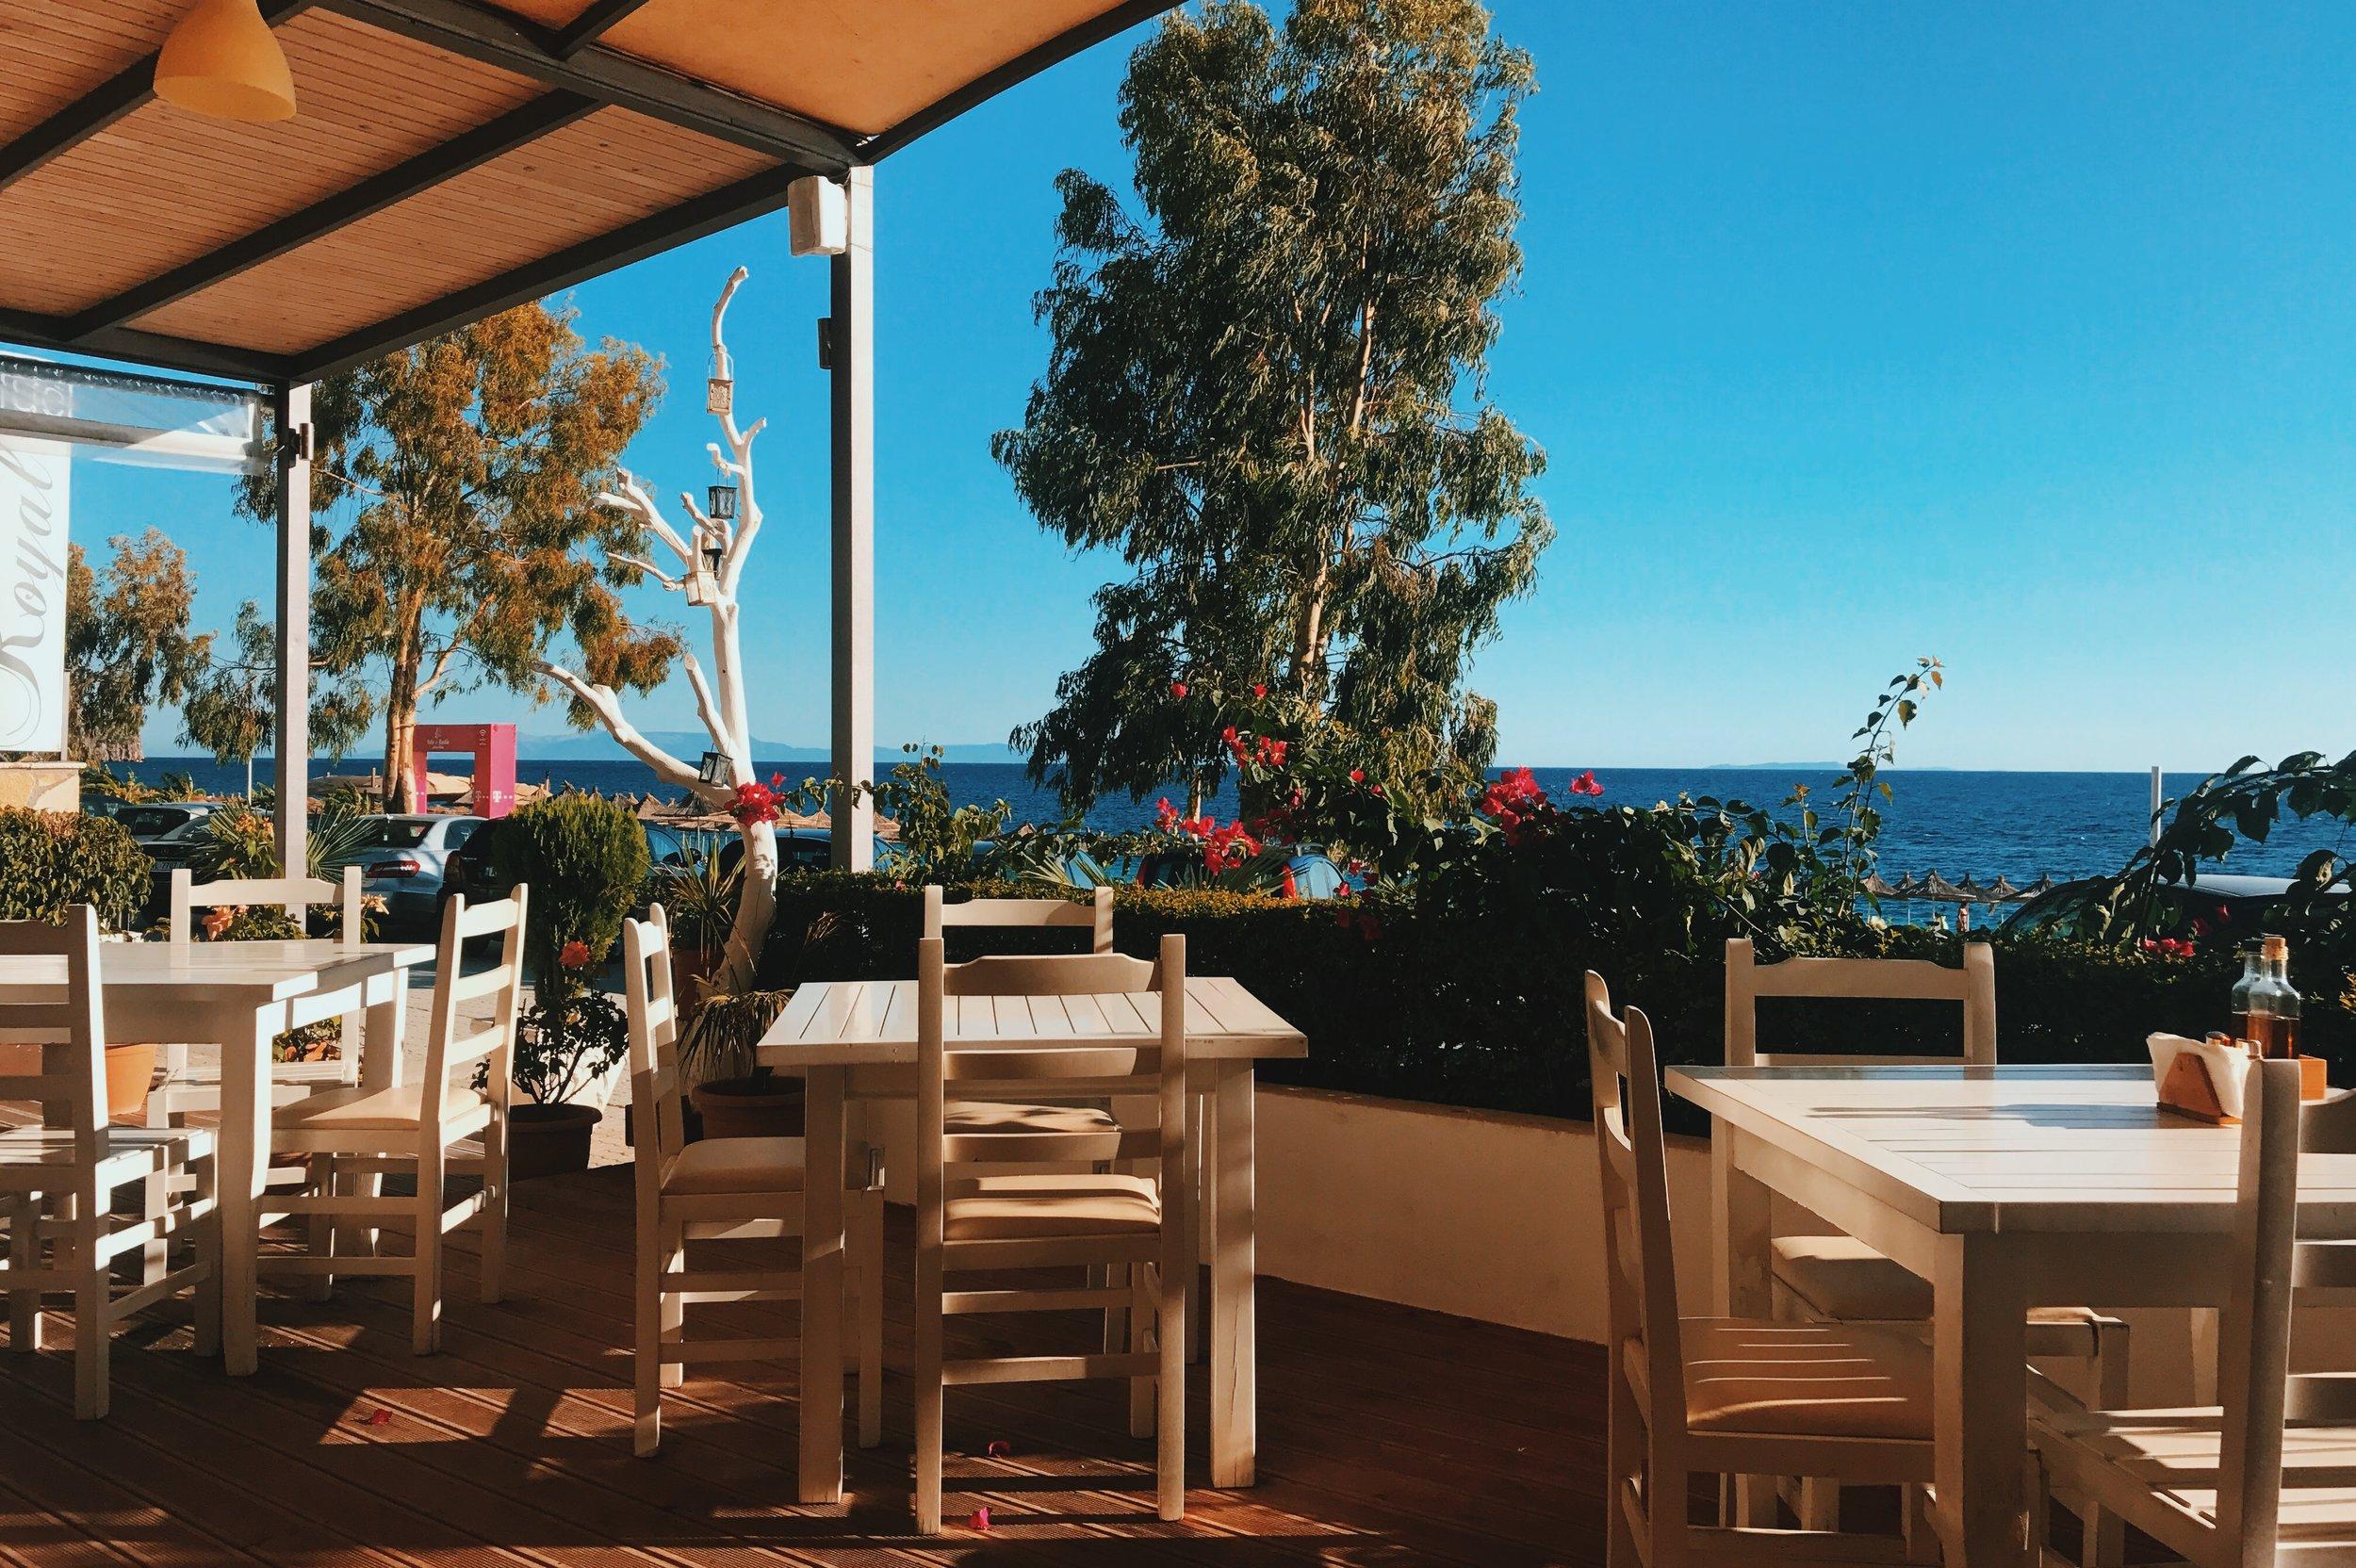 The Royal Blue Restaurant in Dhermi, Albania